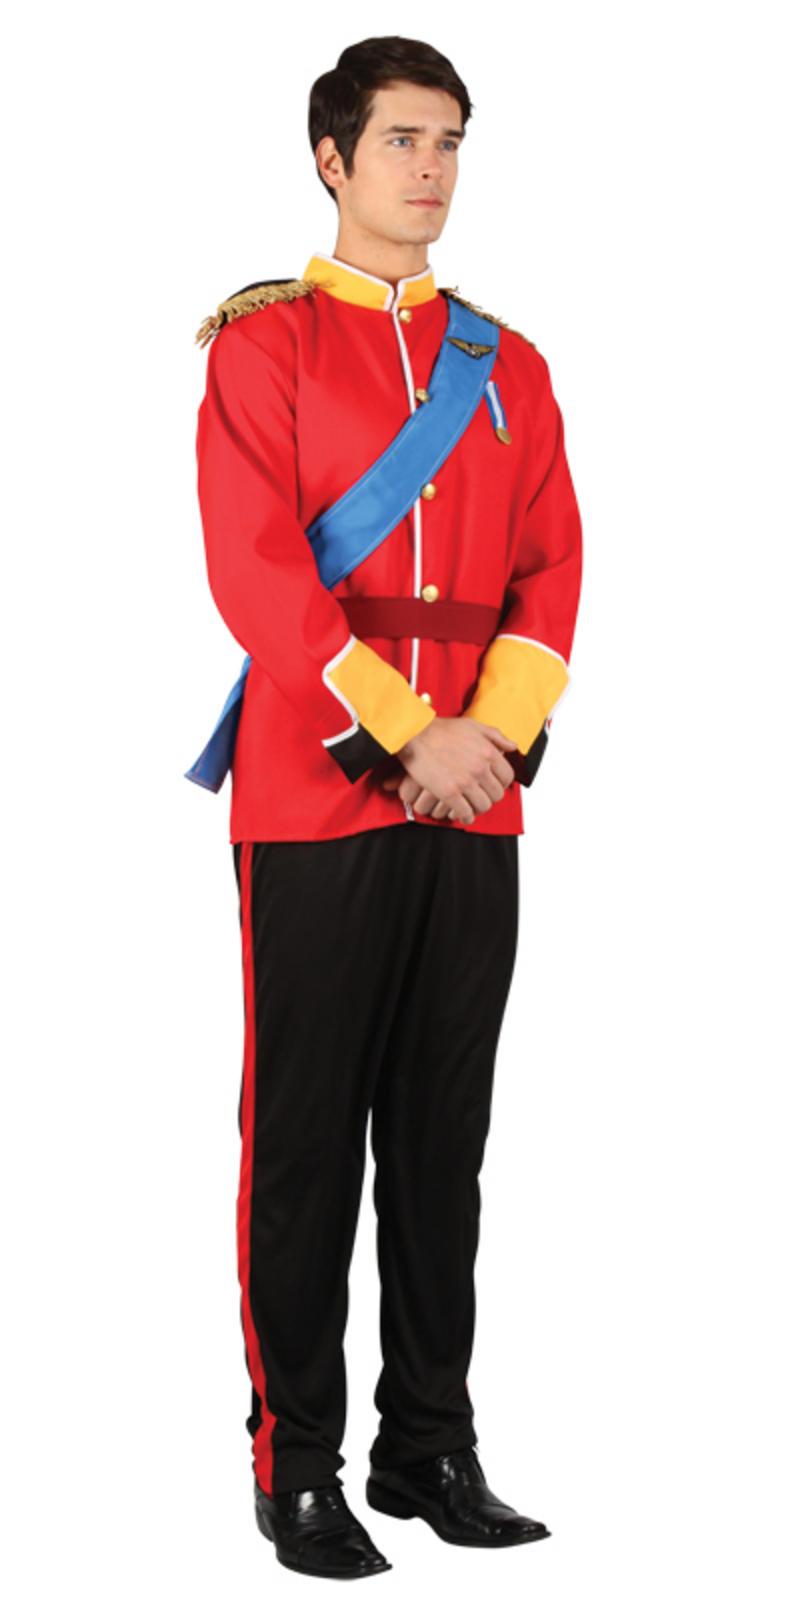 Royal Wedding Sticker Dress Up : British royal wedding adults fancy dress prince william